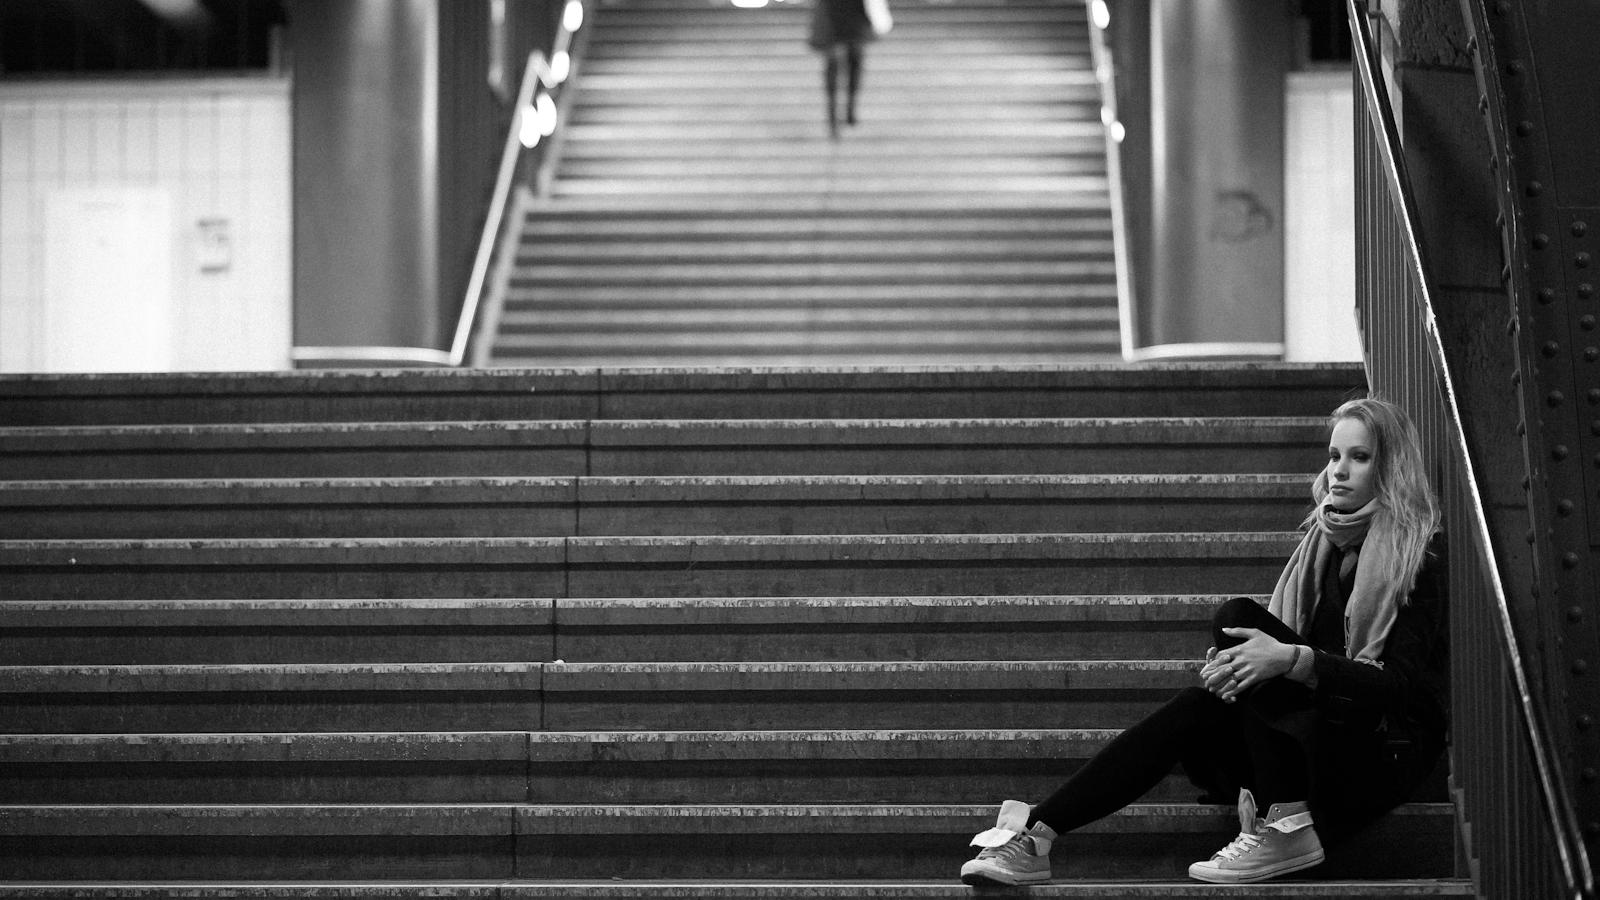 Melancholia Berlin